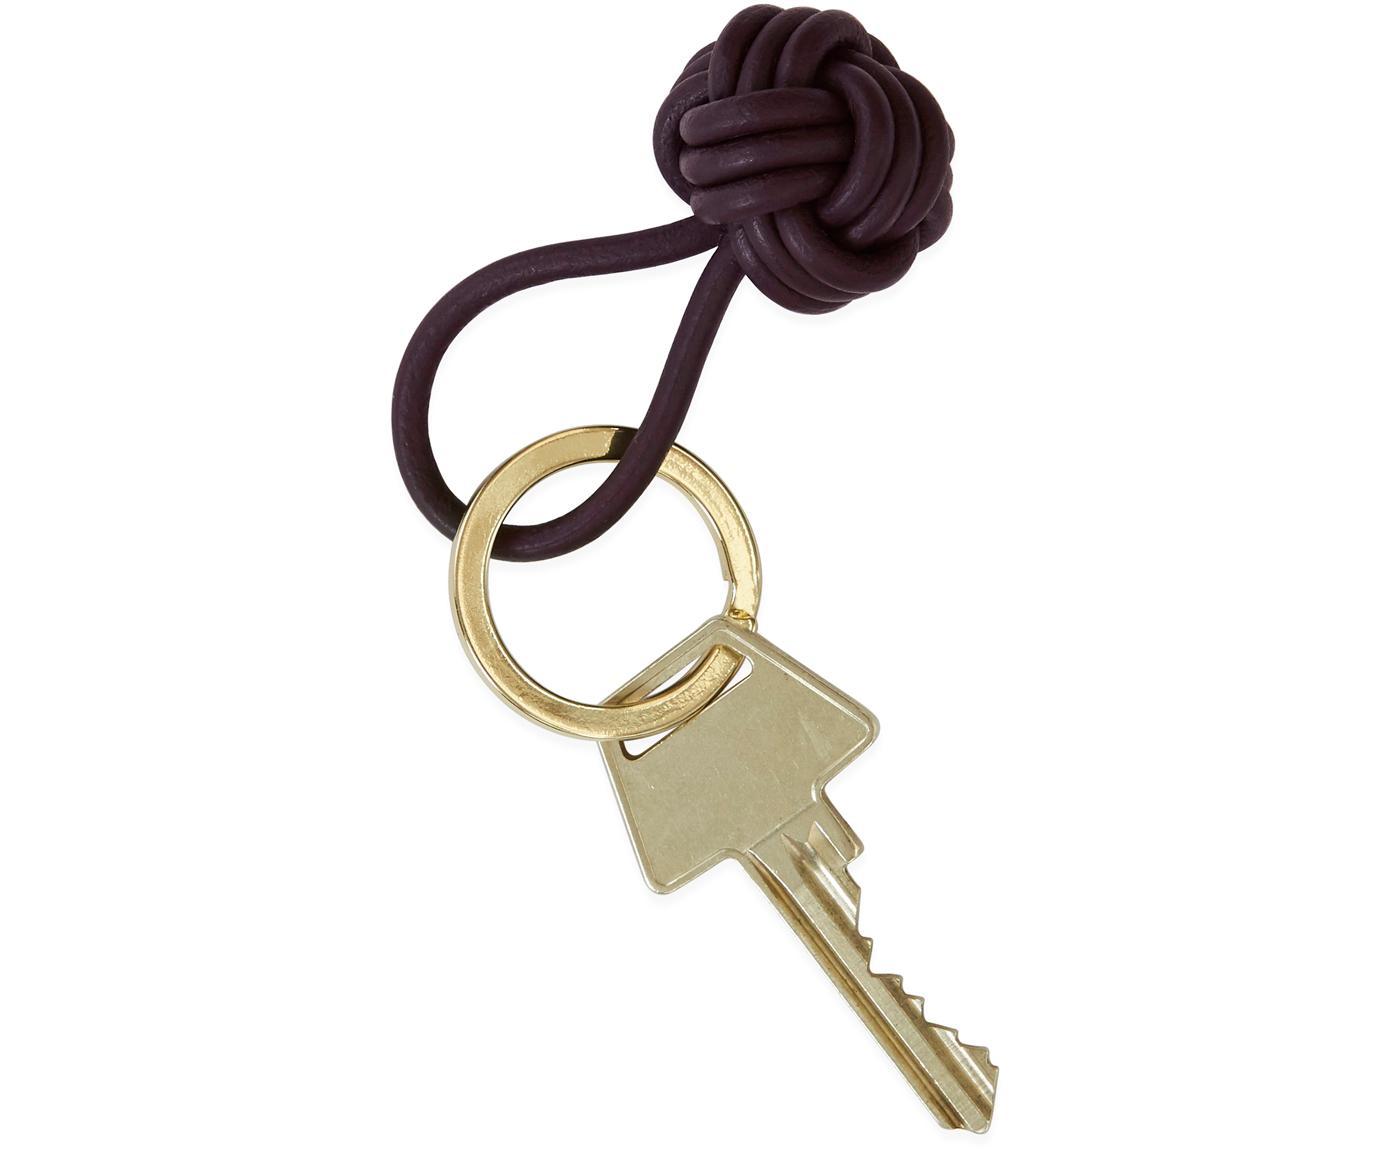 Schlüsselanhänger Knot, Leder, Bordeaux, Ø 4 cm